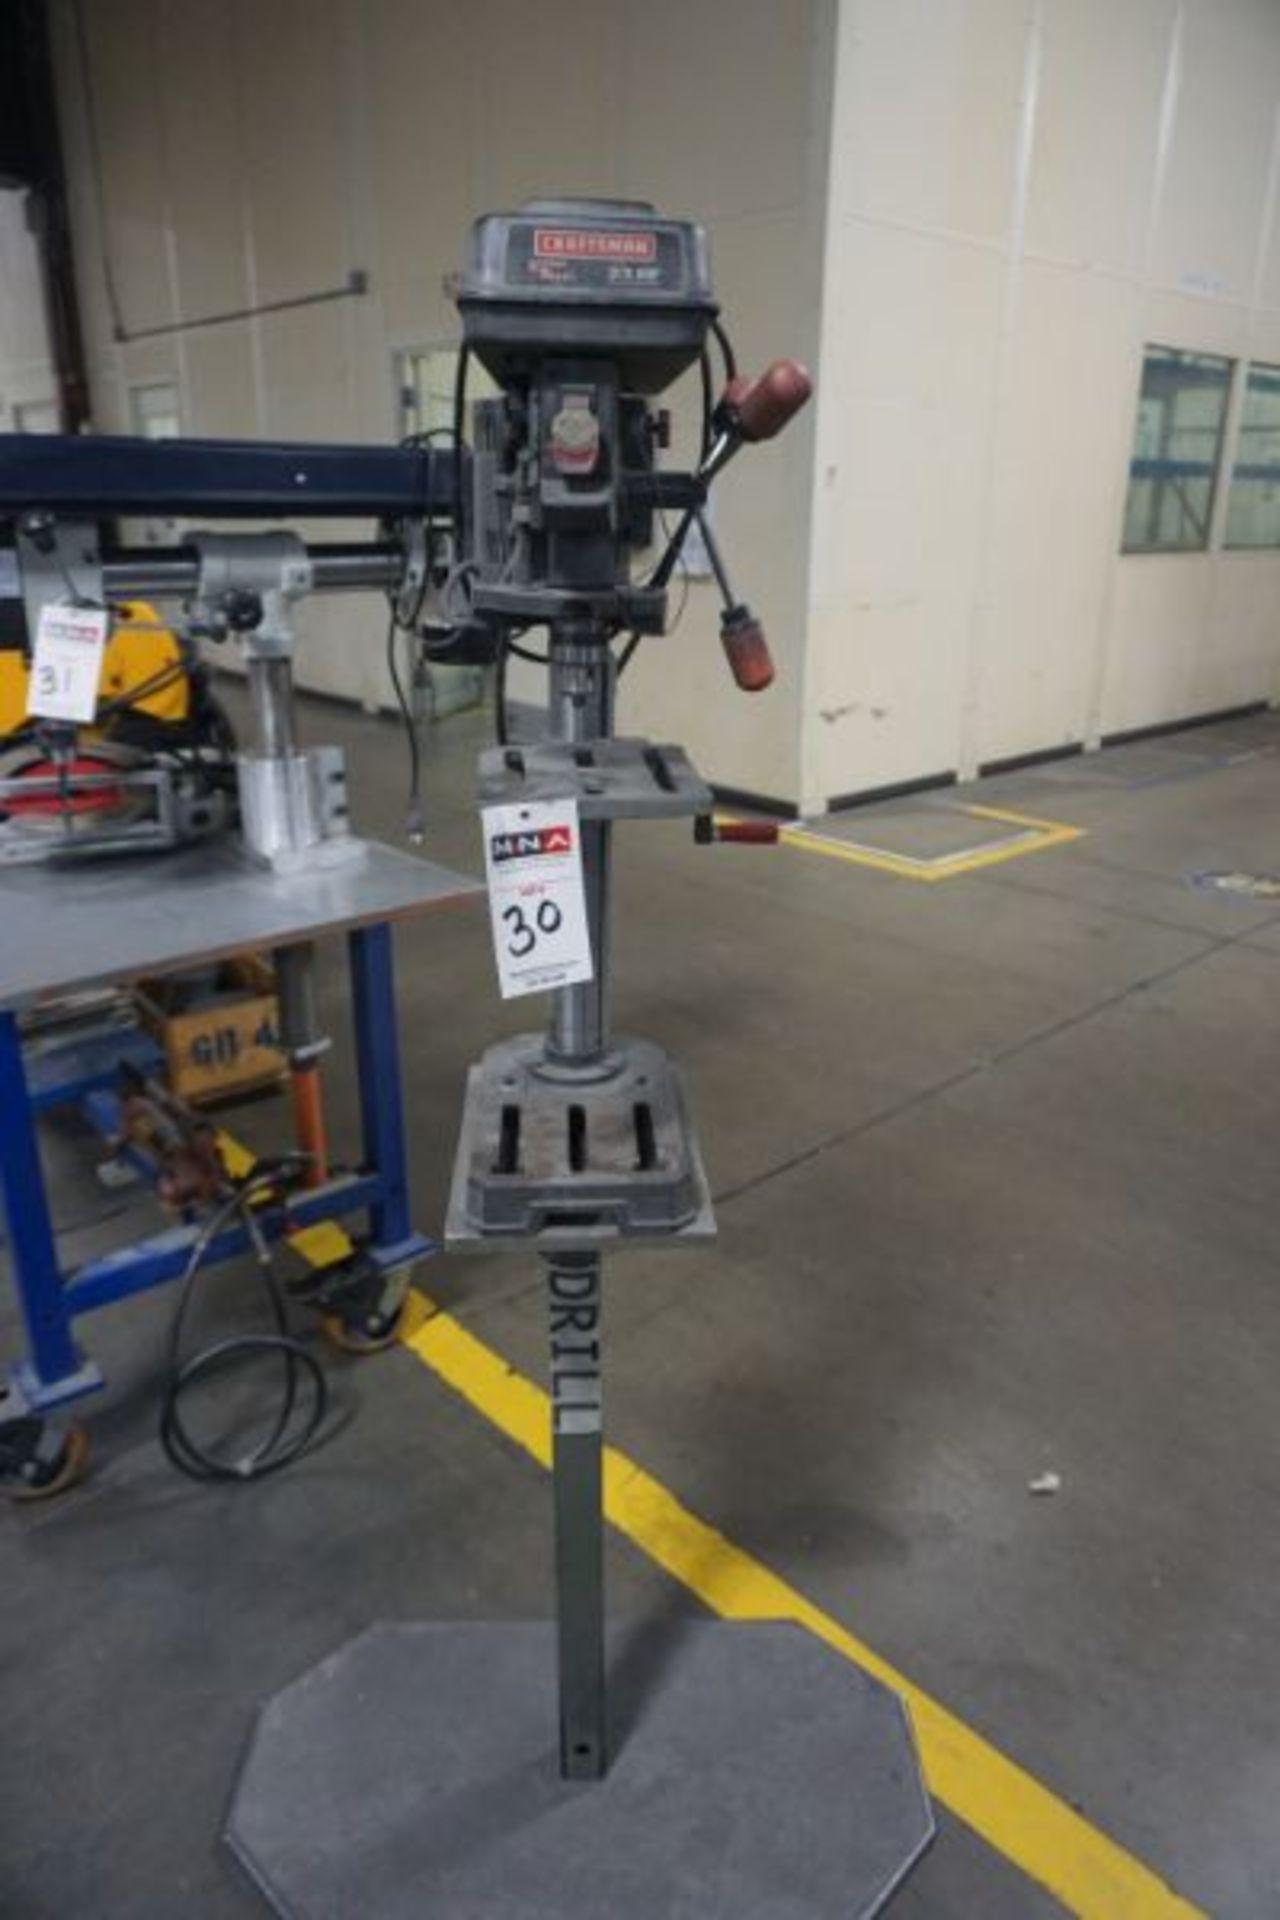 Craftsman Laser Trac 3/4 HP Drill Press - Image 2 of 3